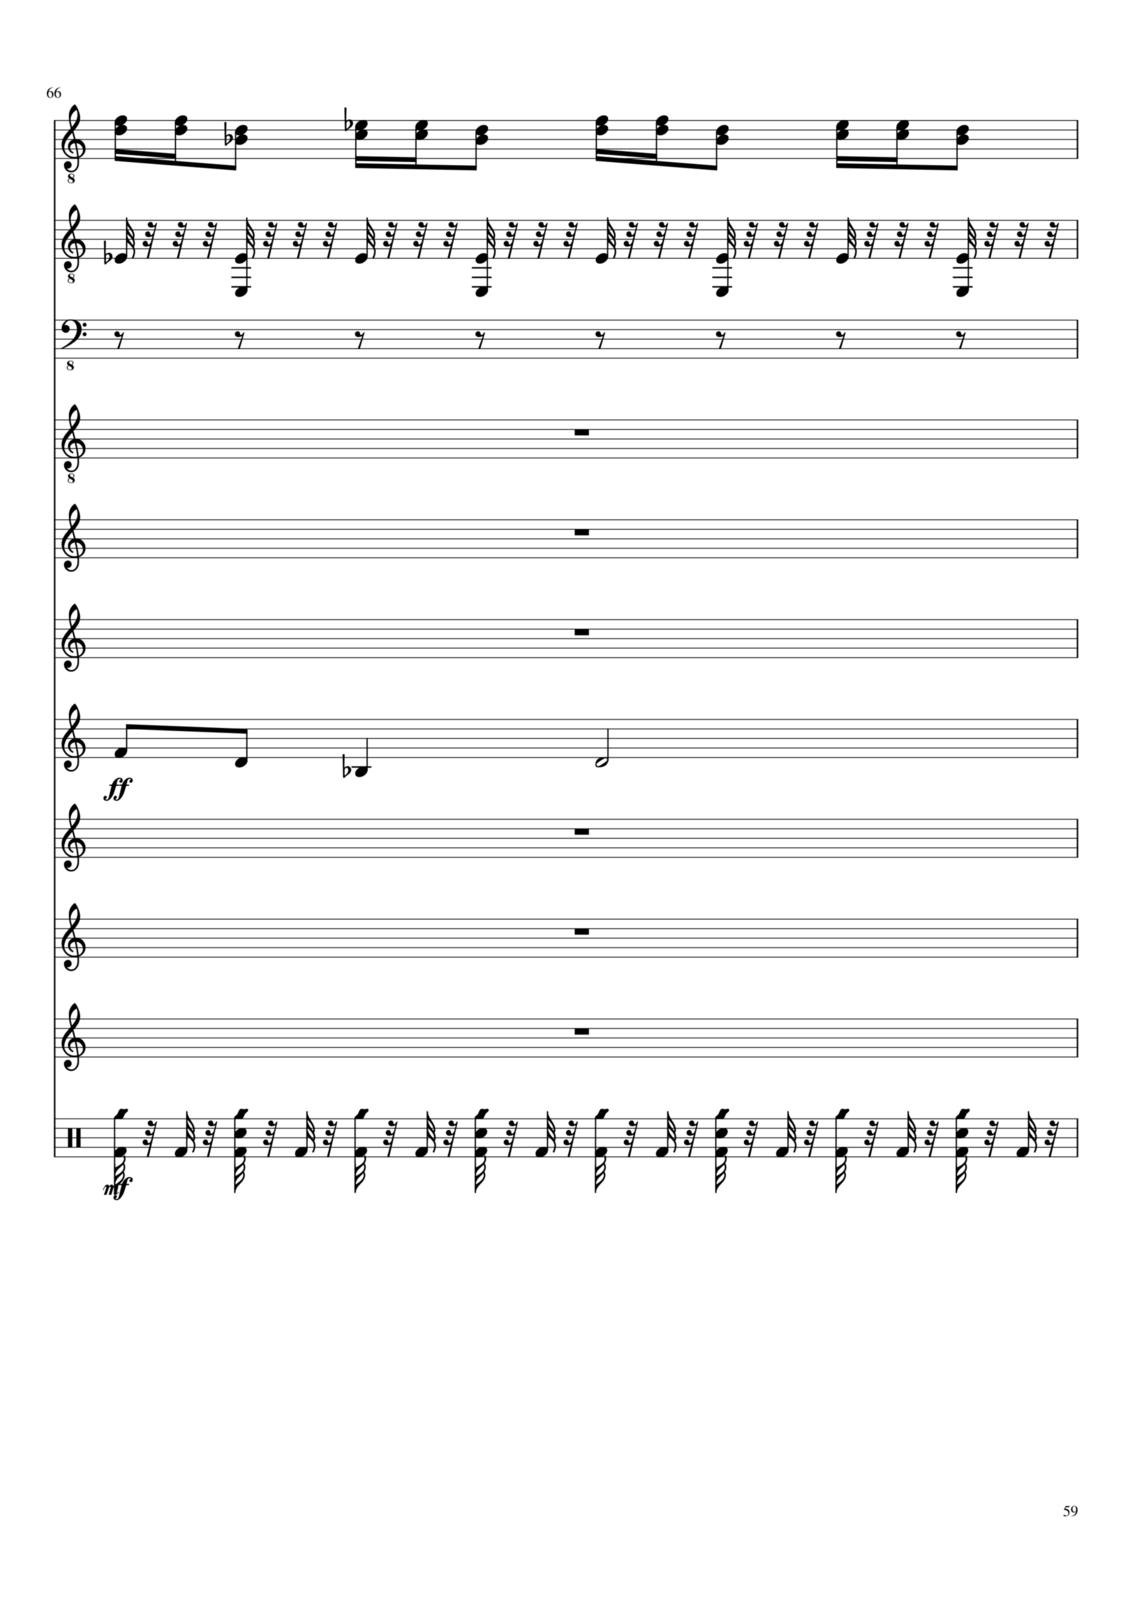 Belyiy sokol slide, Image 59